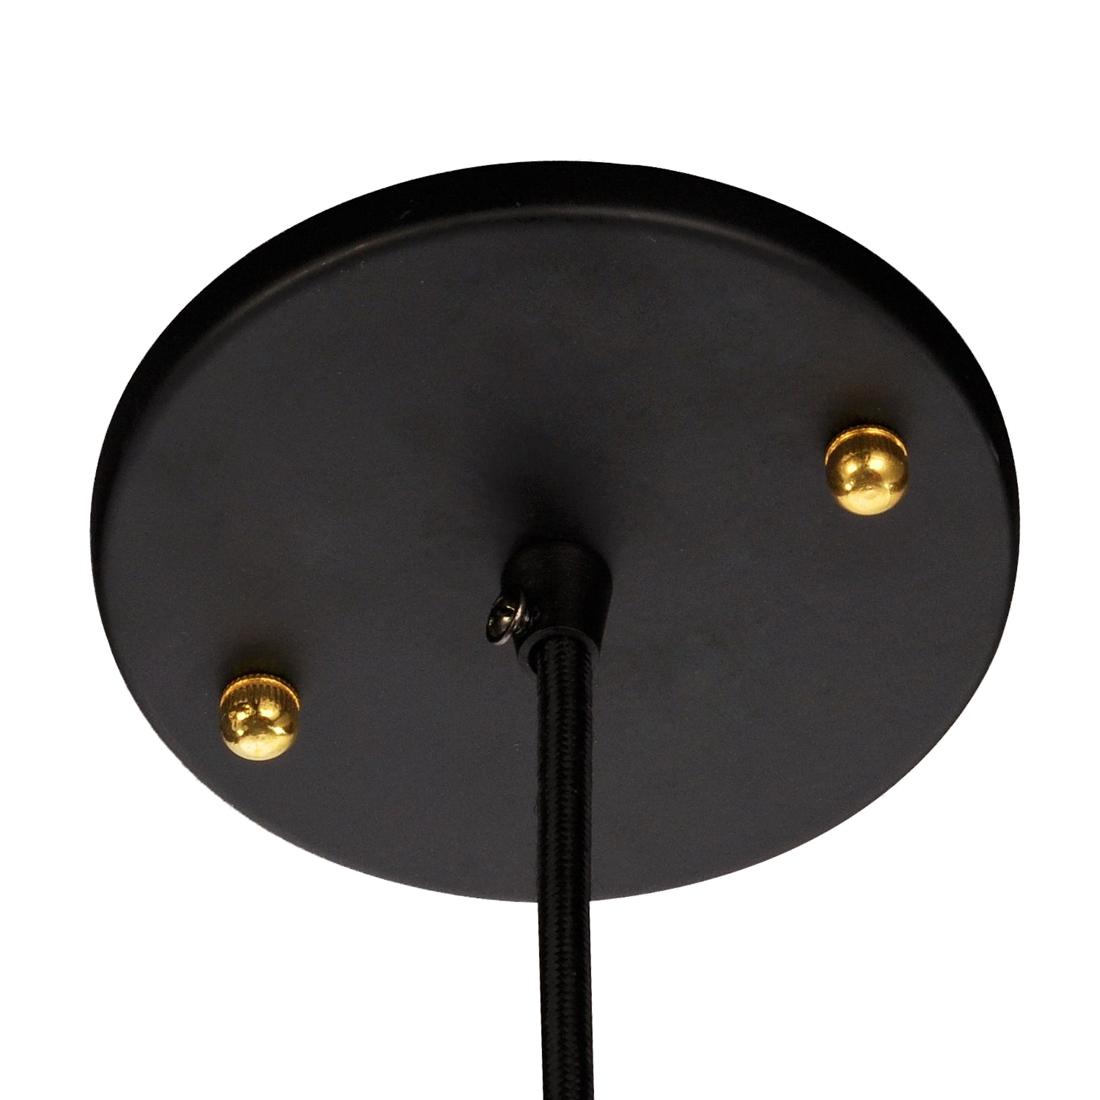 Garage Metal Ceiling Light Vintage Retro Chandelier